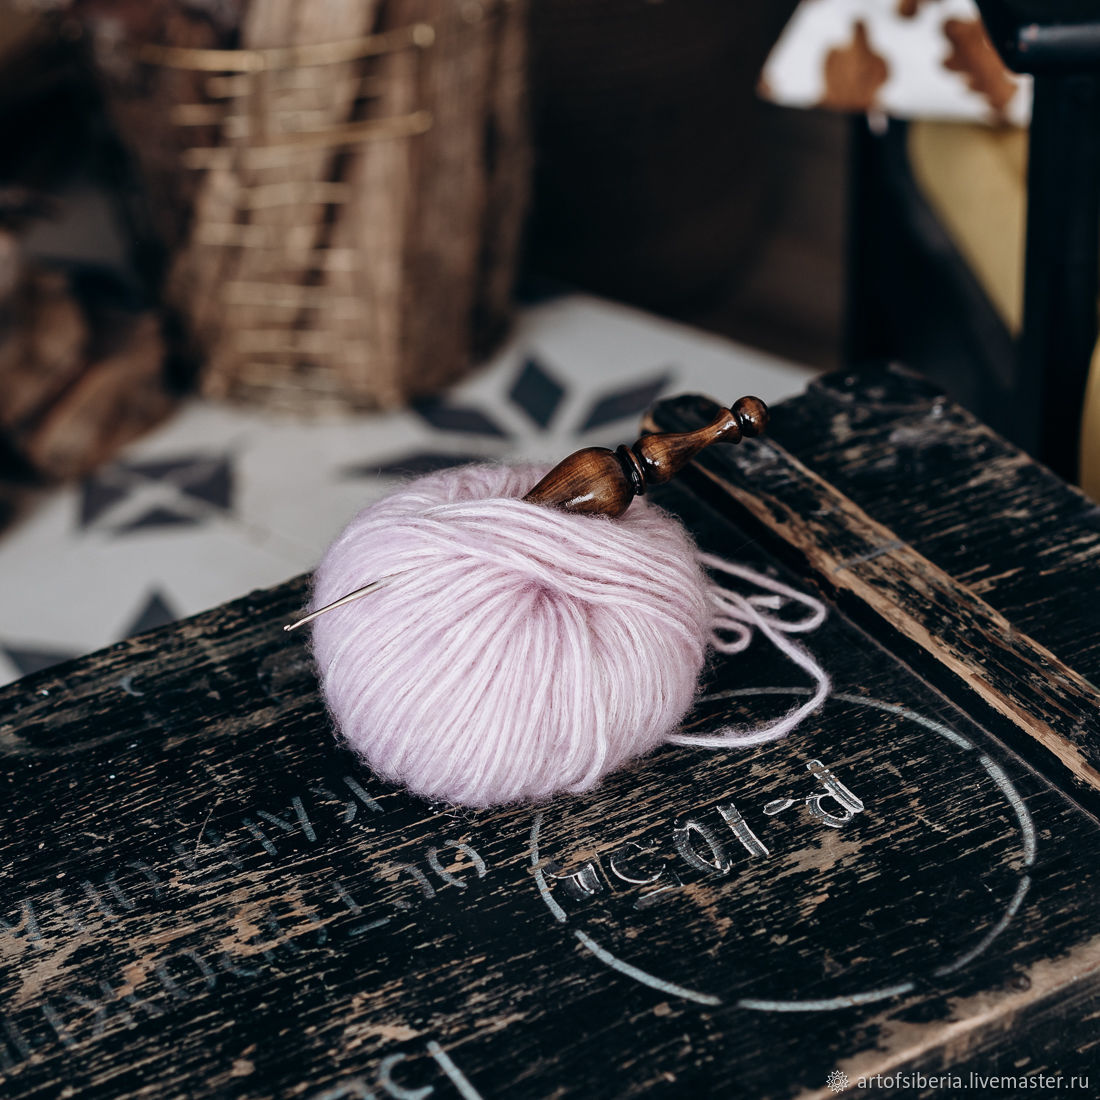 1,75 mm iron crochet hook with wooden handle (cedar) K221, Crochet Hooks, Novokuznetsk,  Фото №1